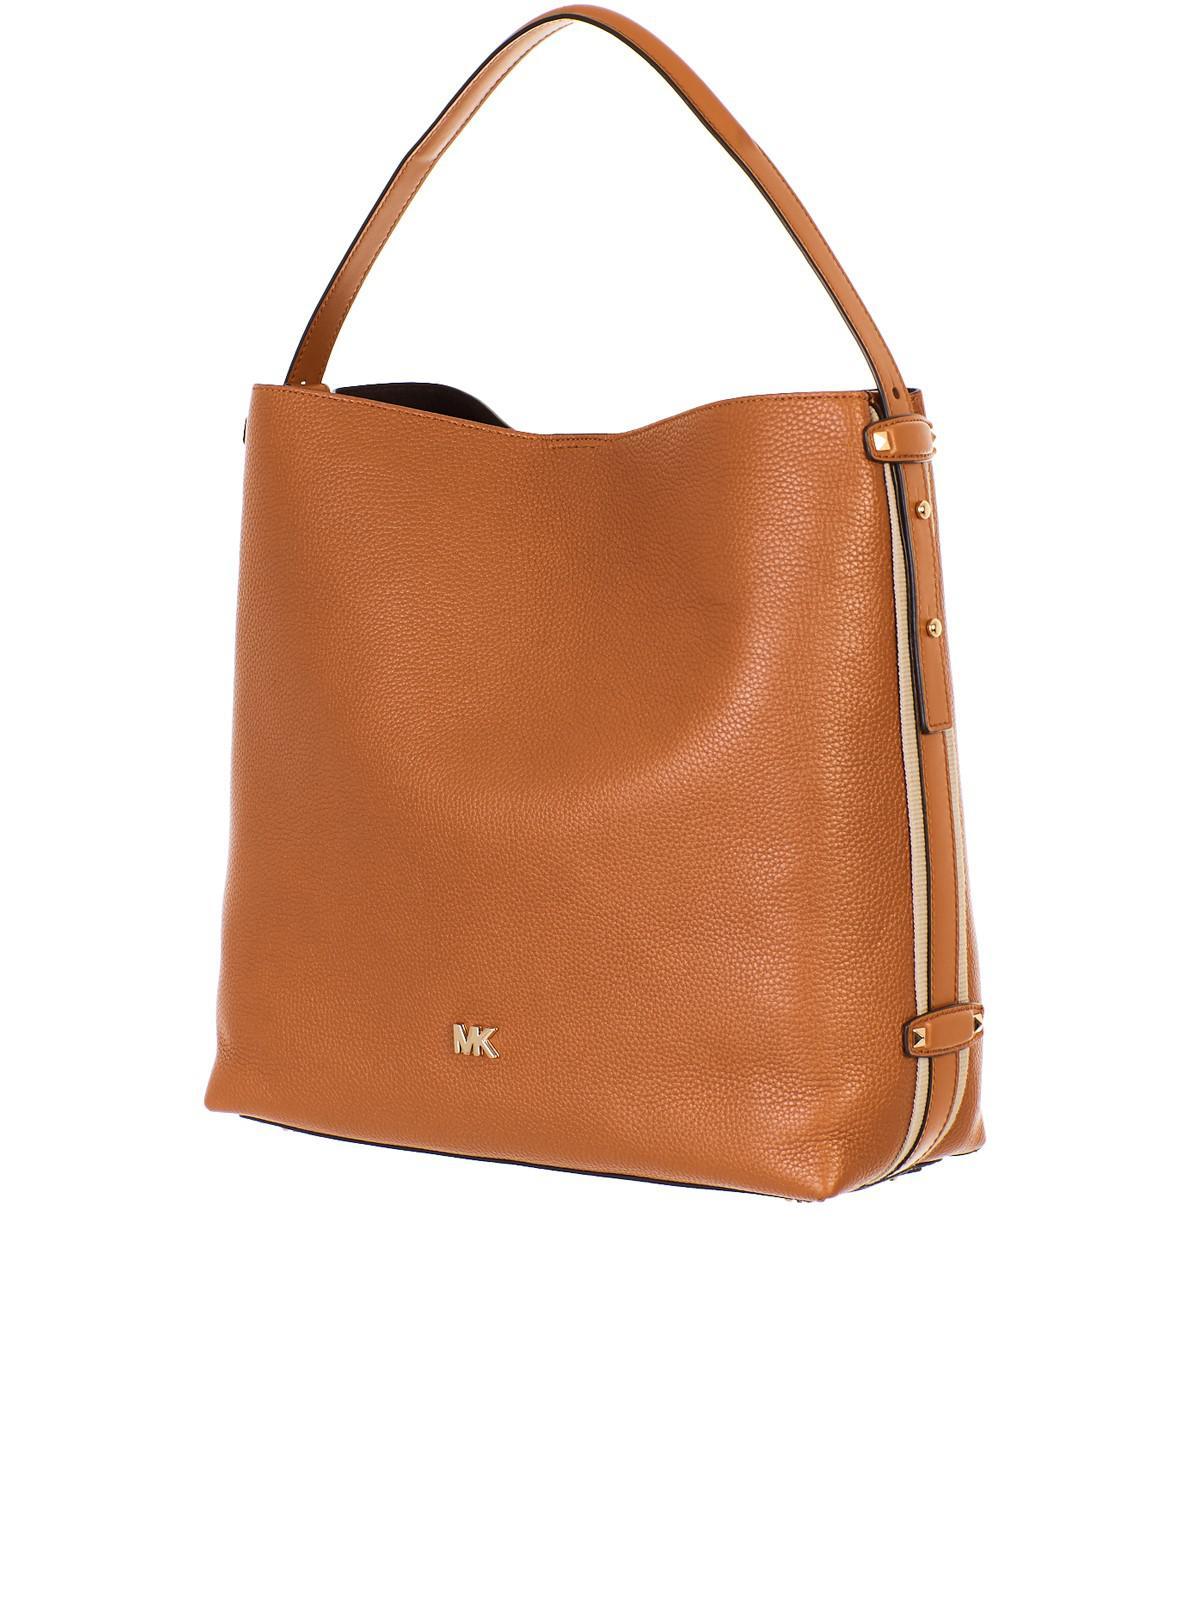 5f6224de4a639c Lyst - Michael Kors Brown Griffin Bag in Brown